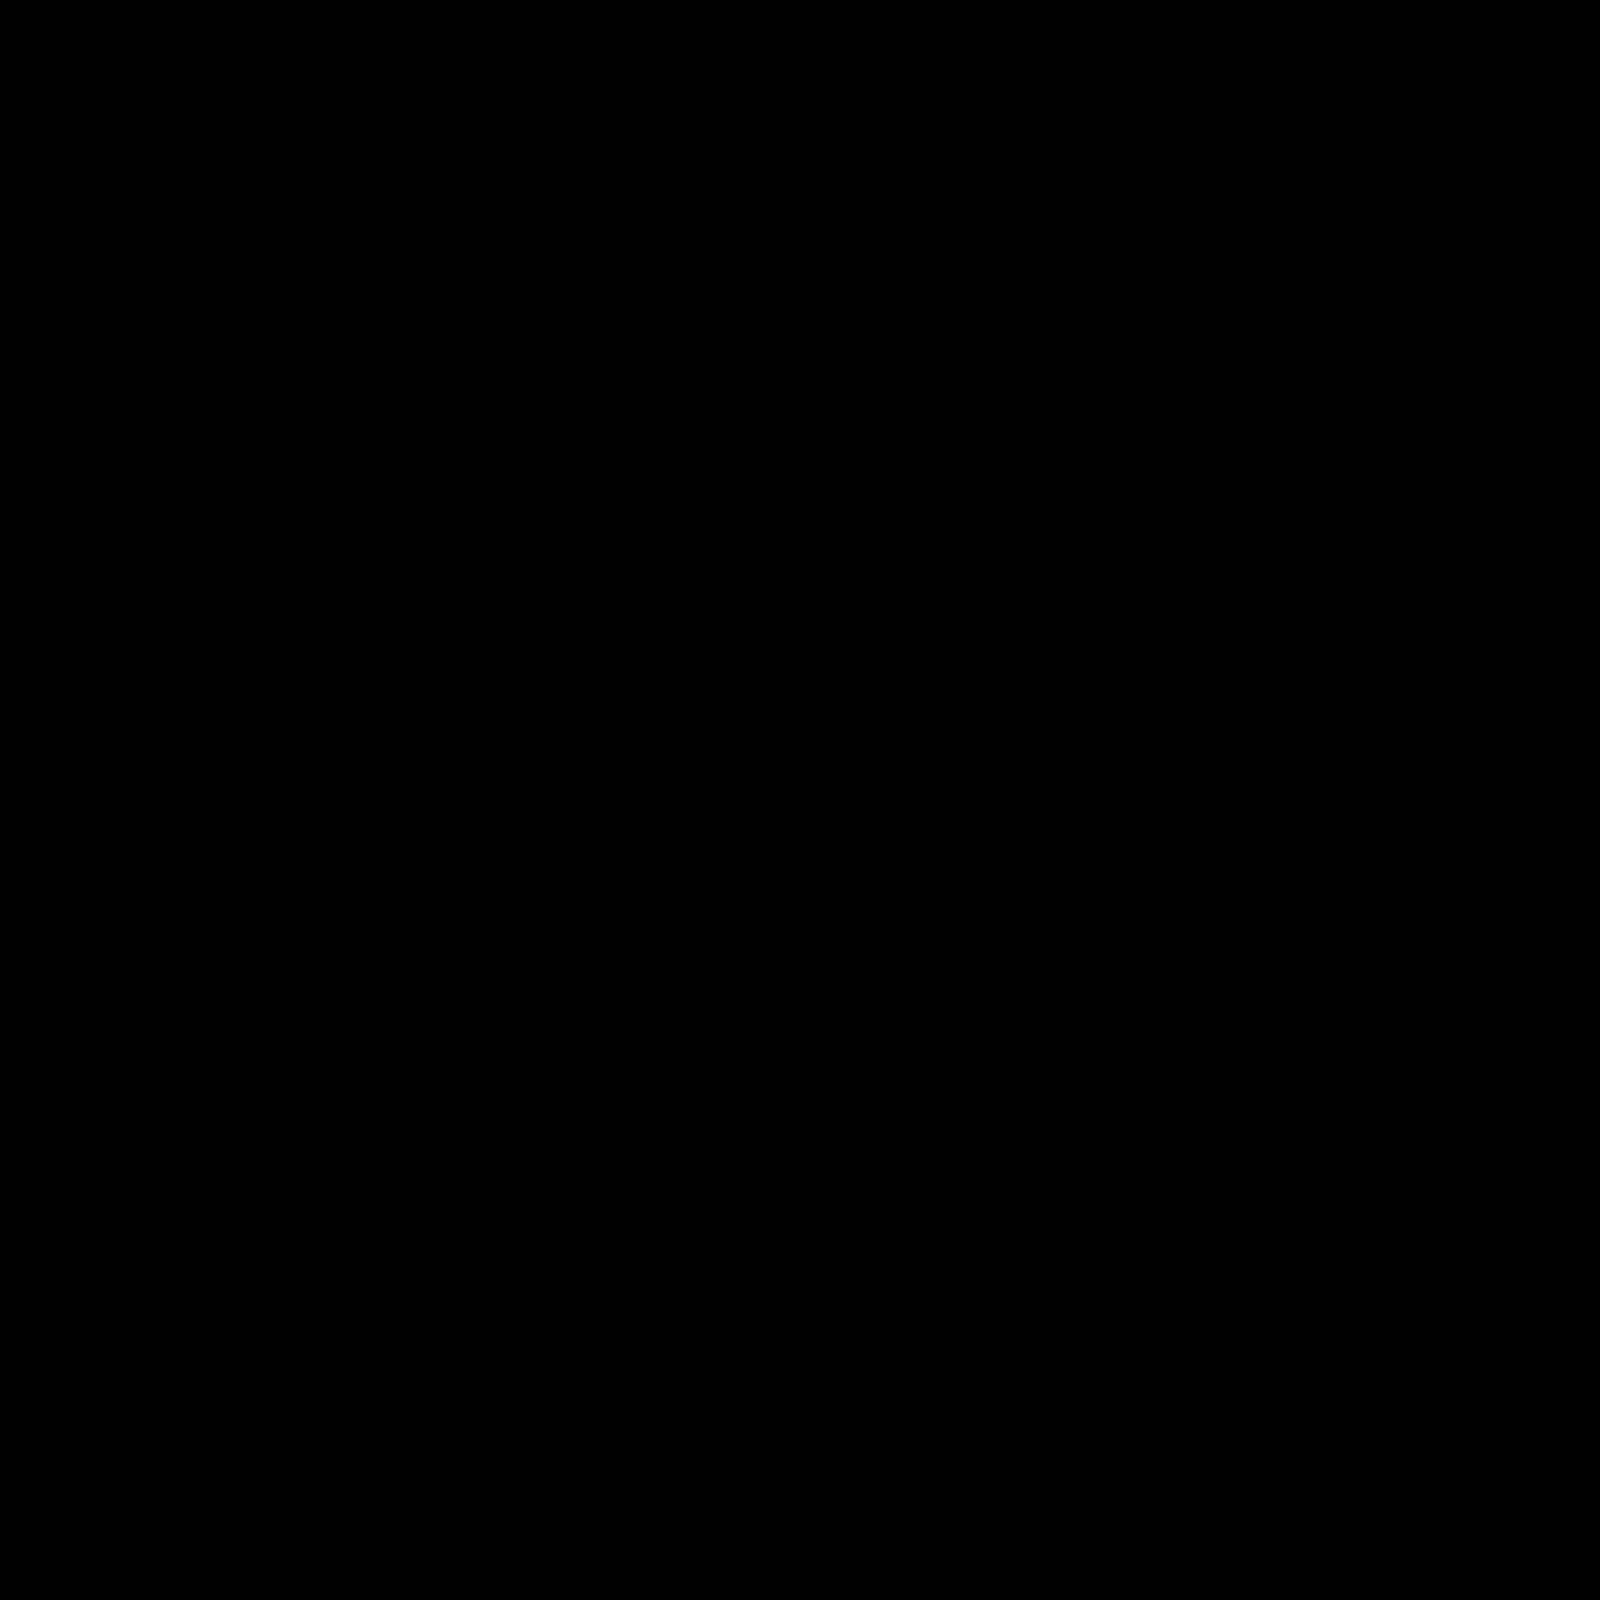 Mapa de Francia icon